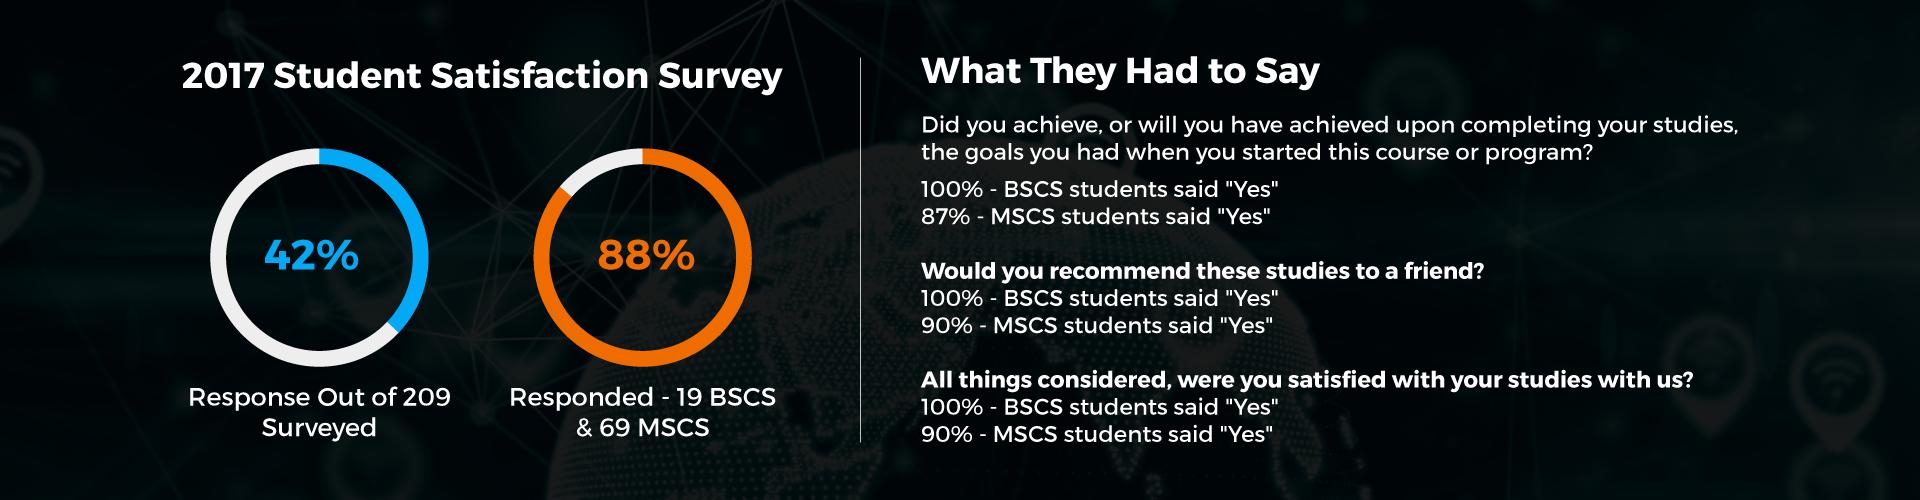 2017-Student-Satisfaction-Survey